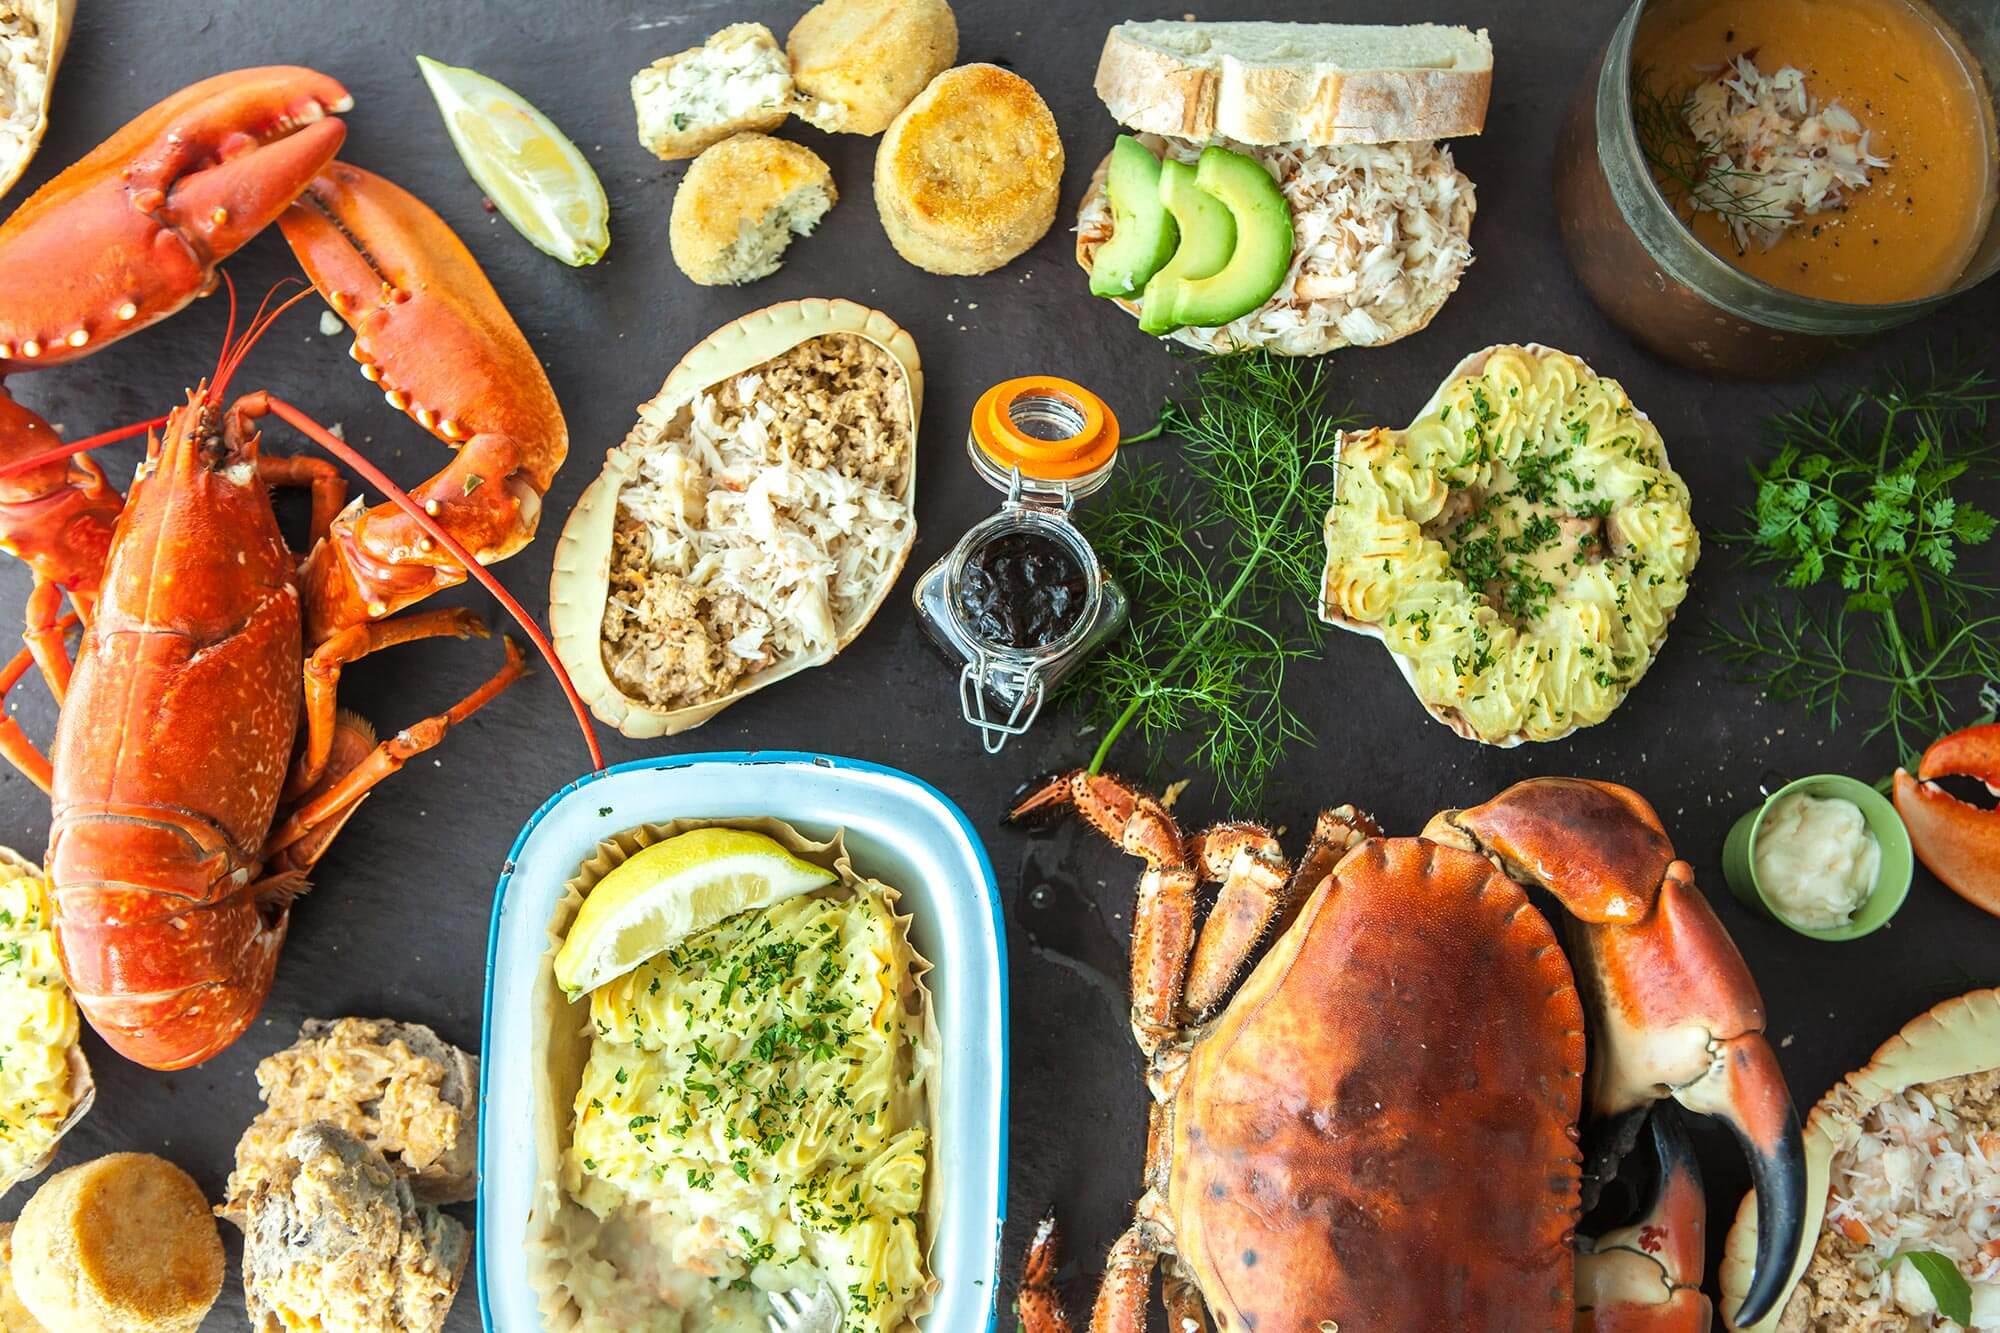 Freshly caught Crab and seafood   Dorset Shellfish